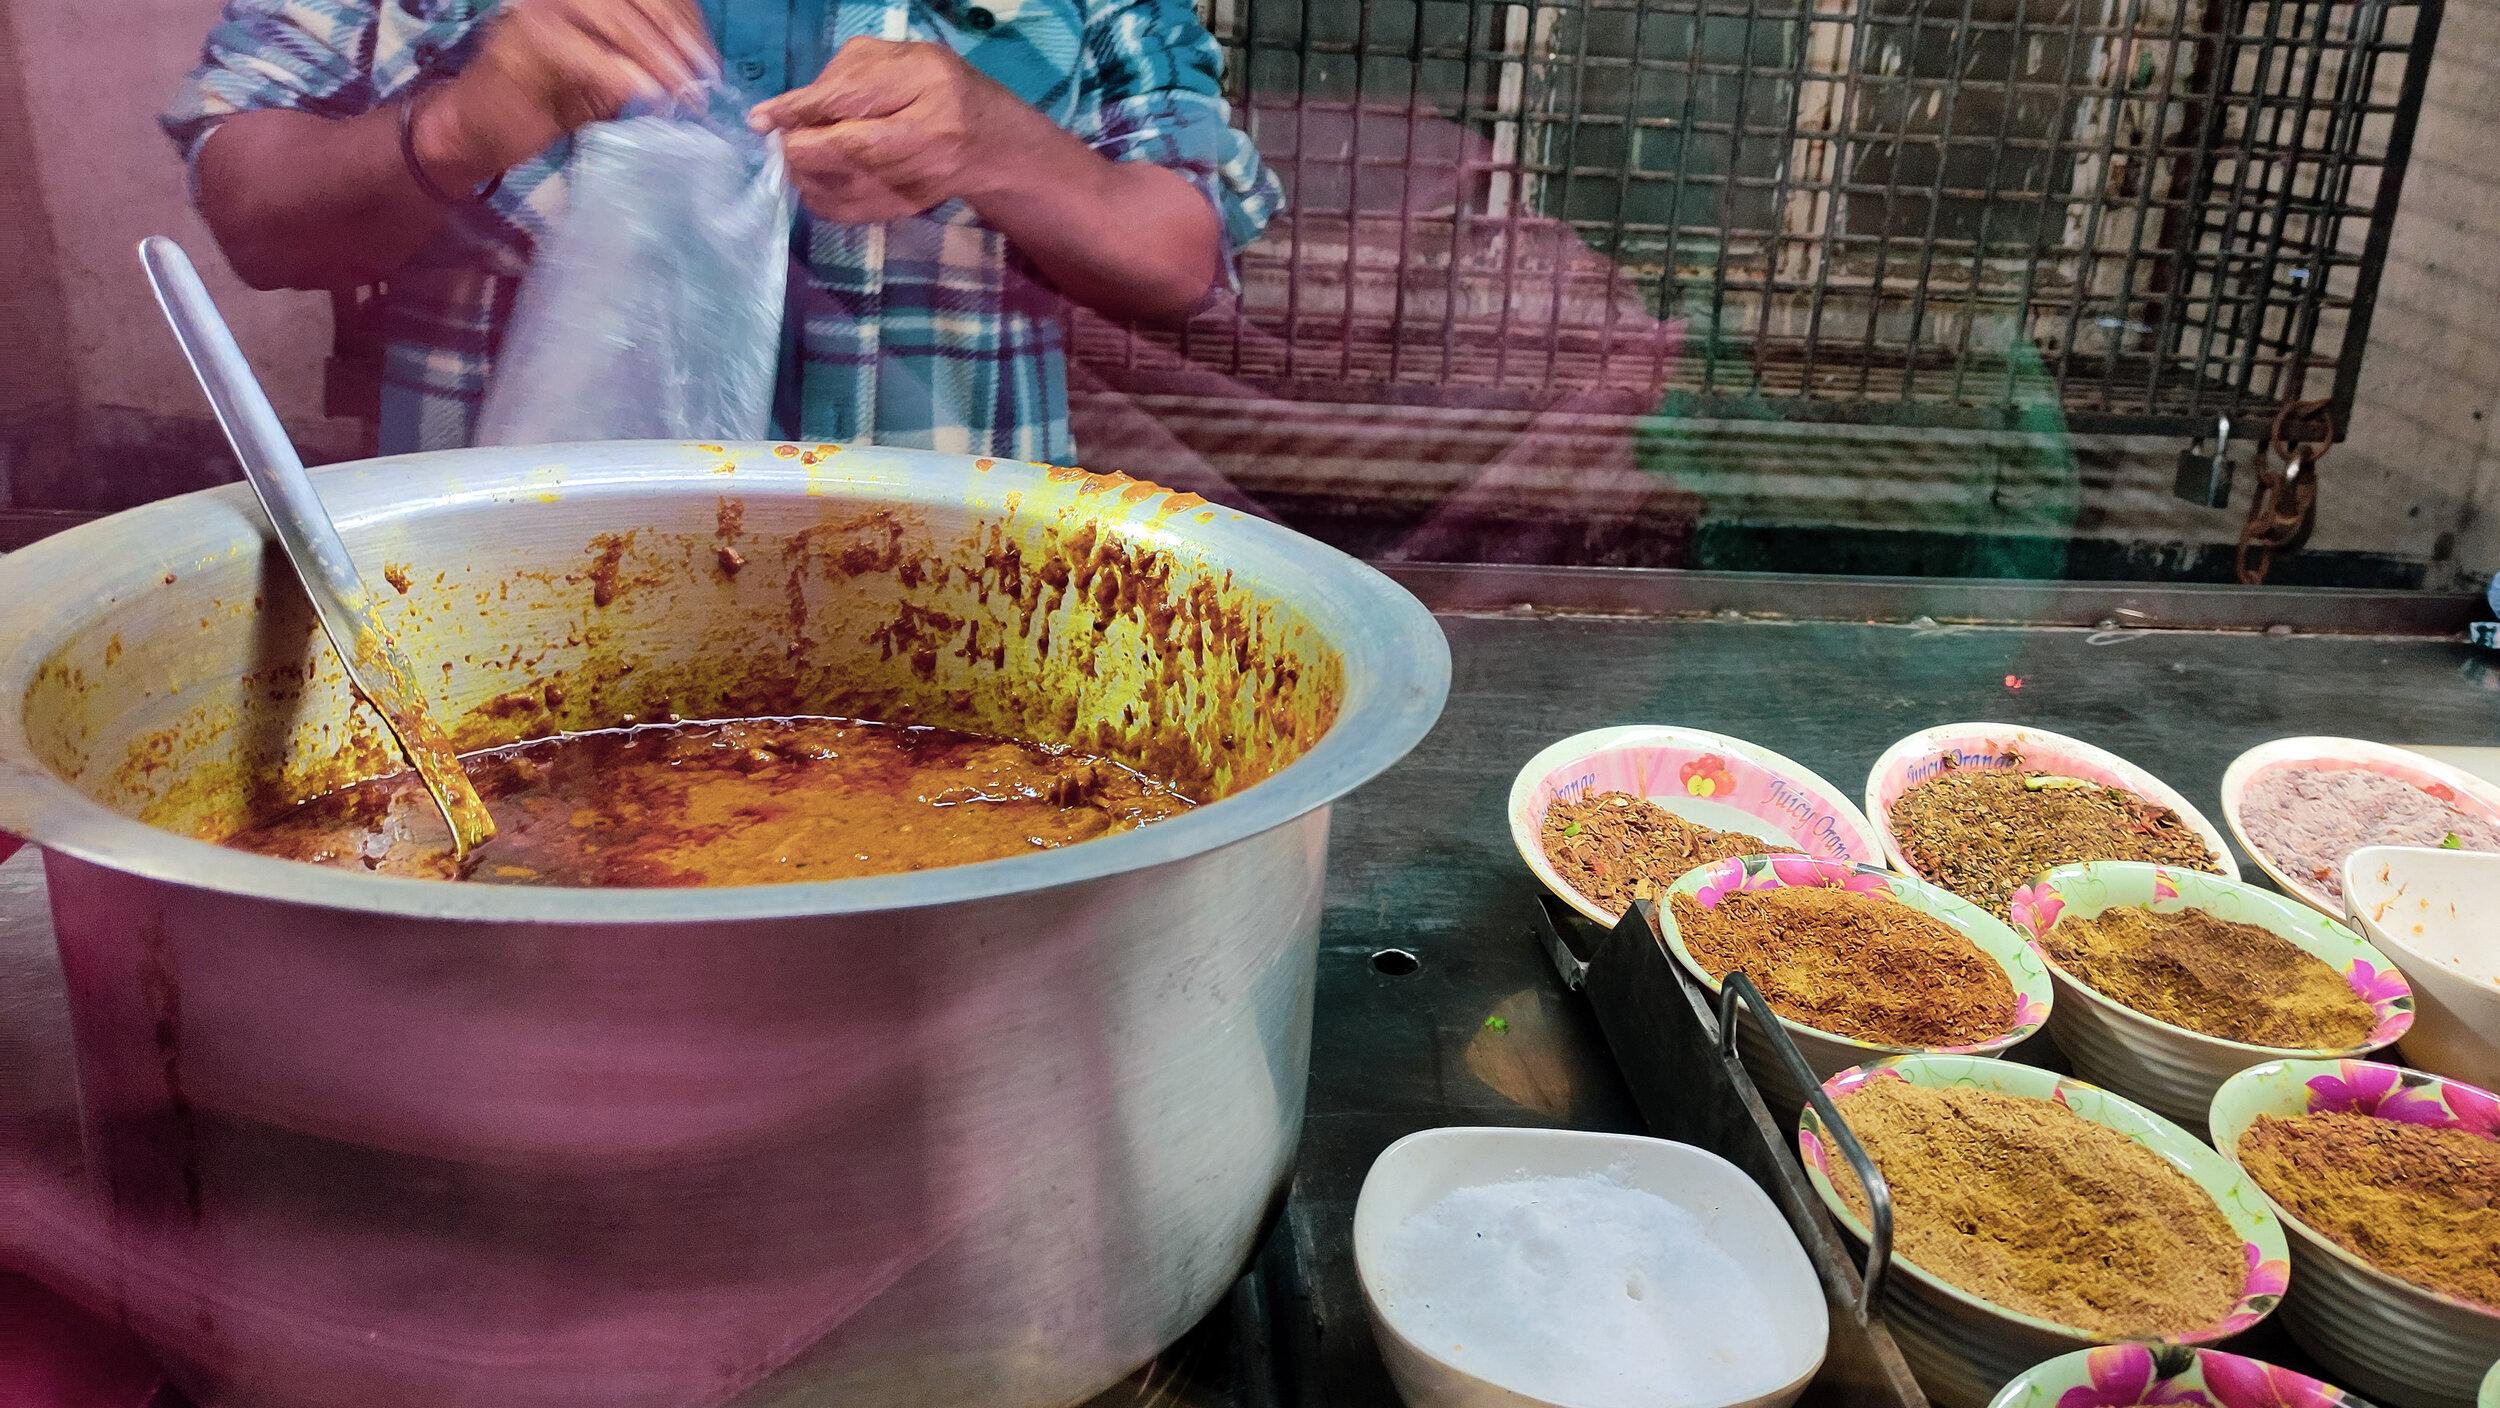 Halim is a staple Bangladeshi food similar to lentil soup.